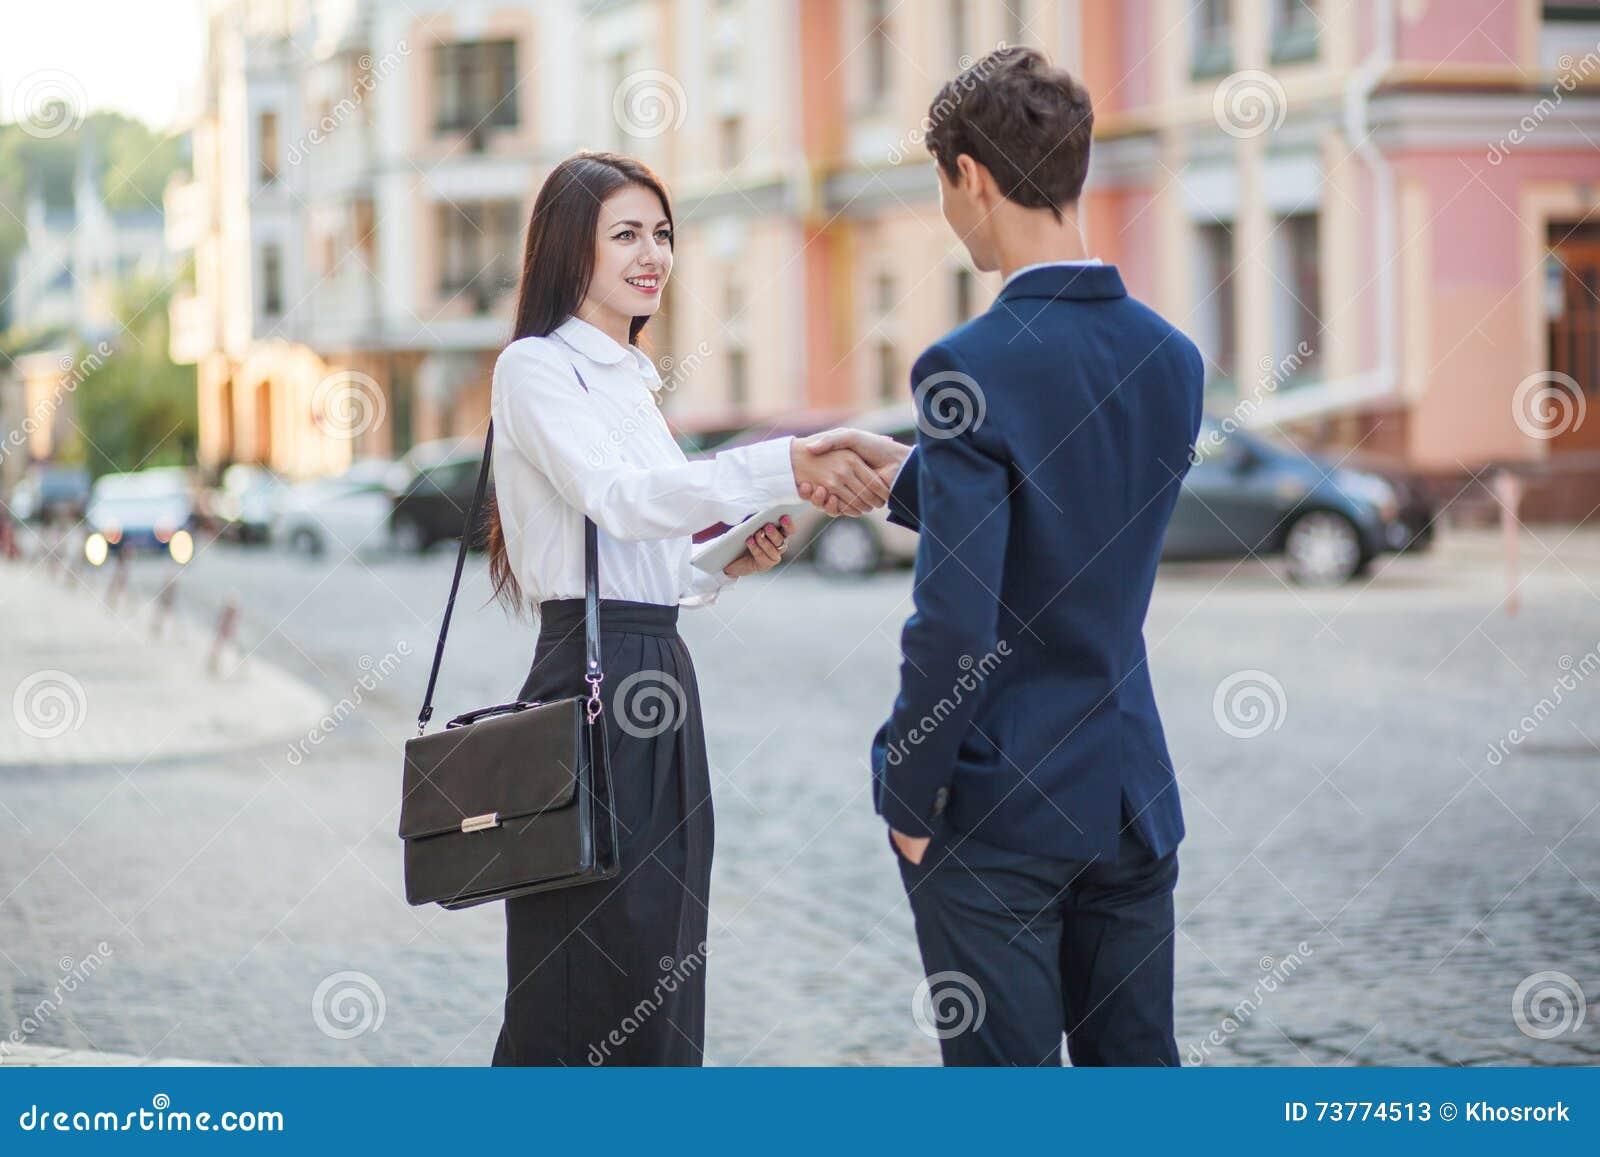 Acquaintance and communication of businessman, businesswoman